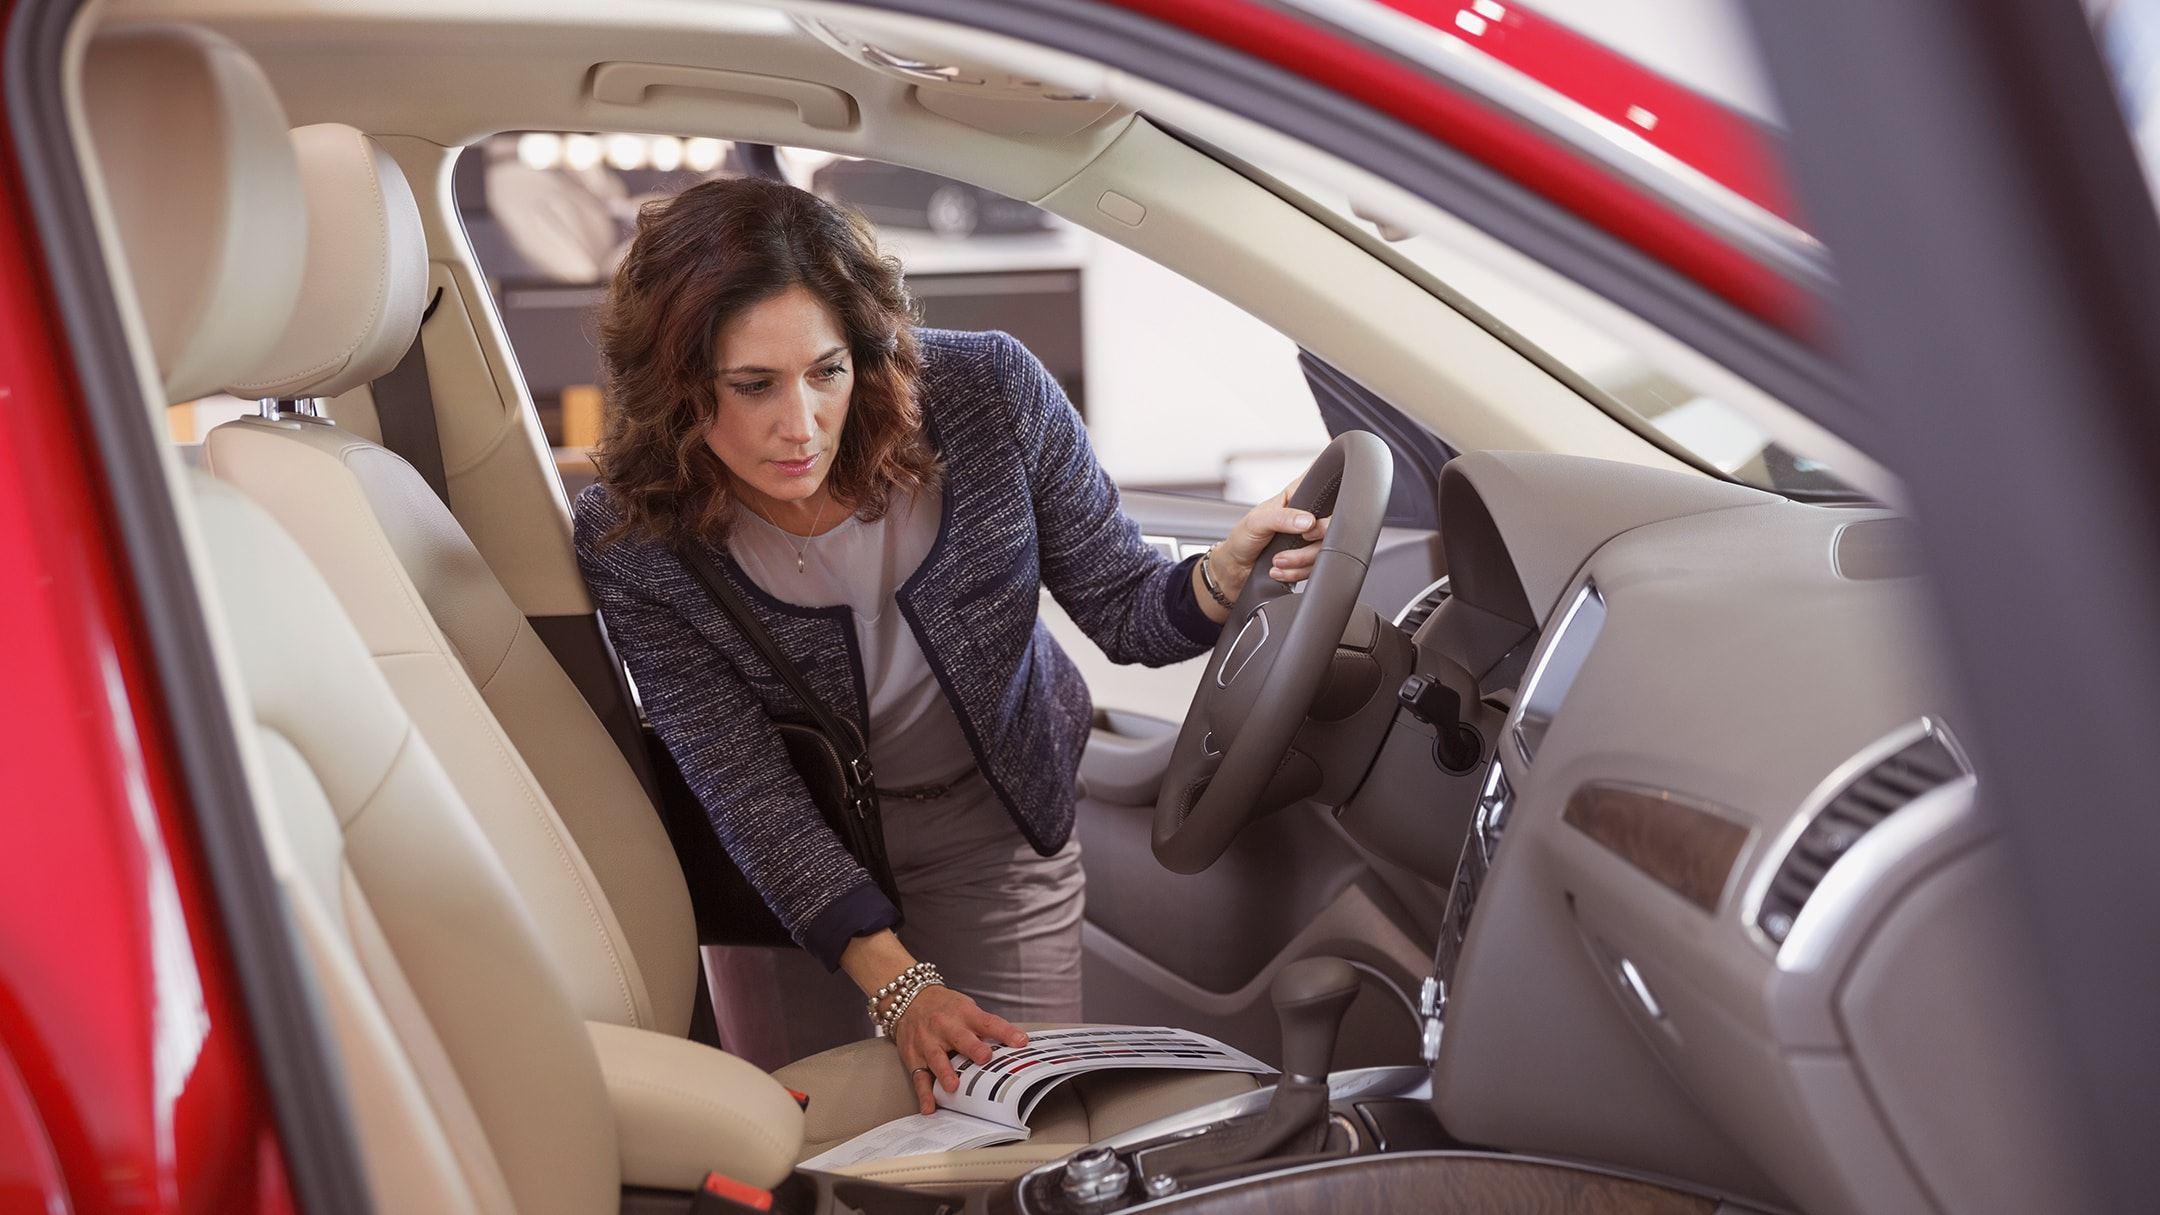 shopper views car interior